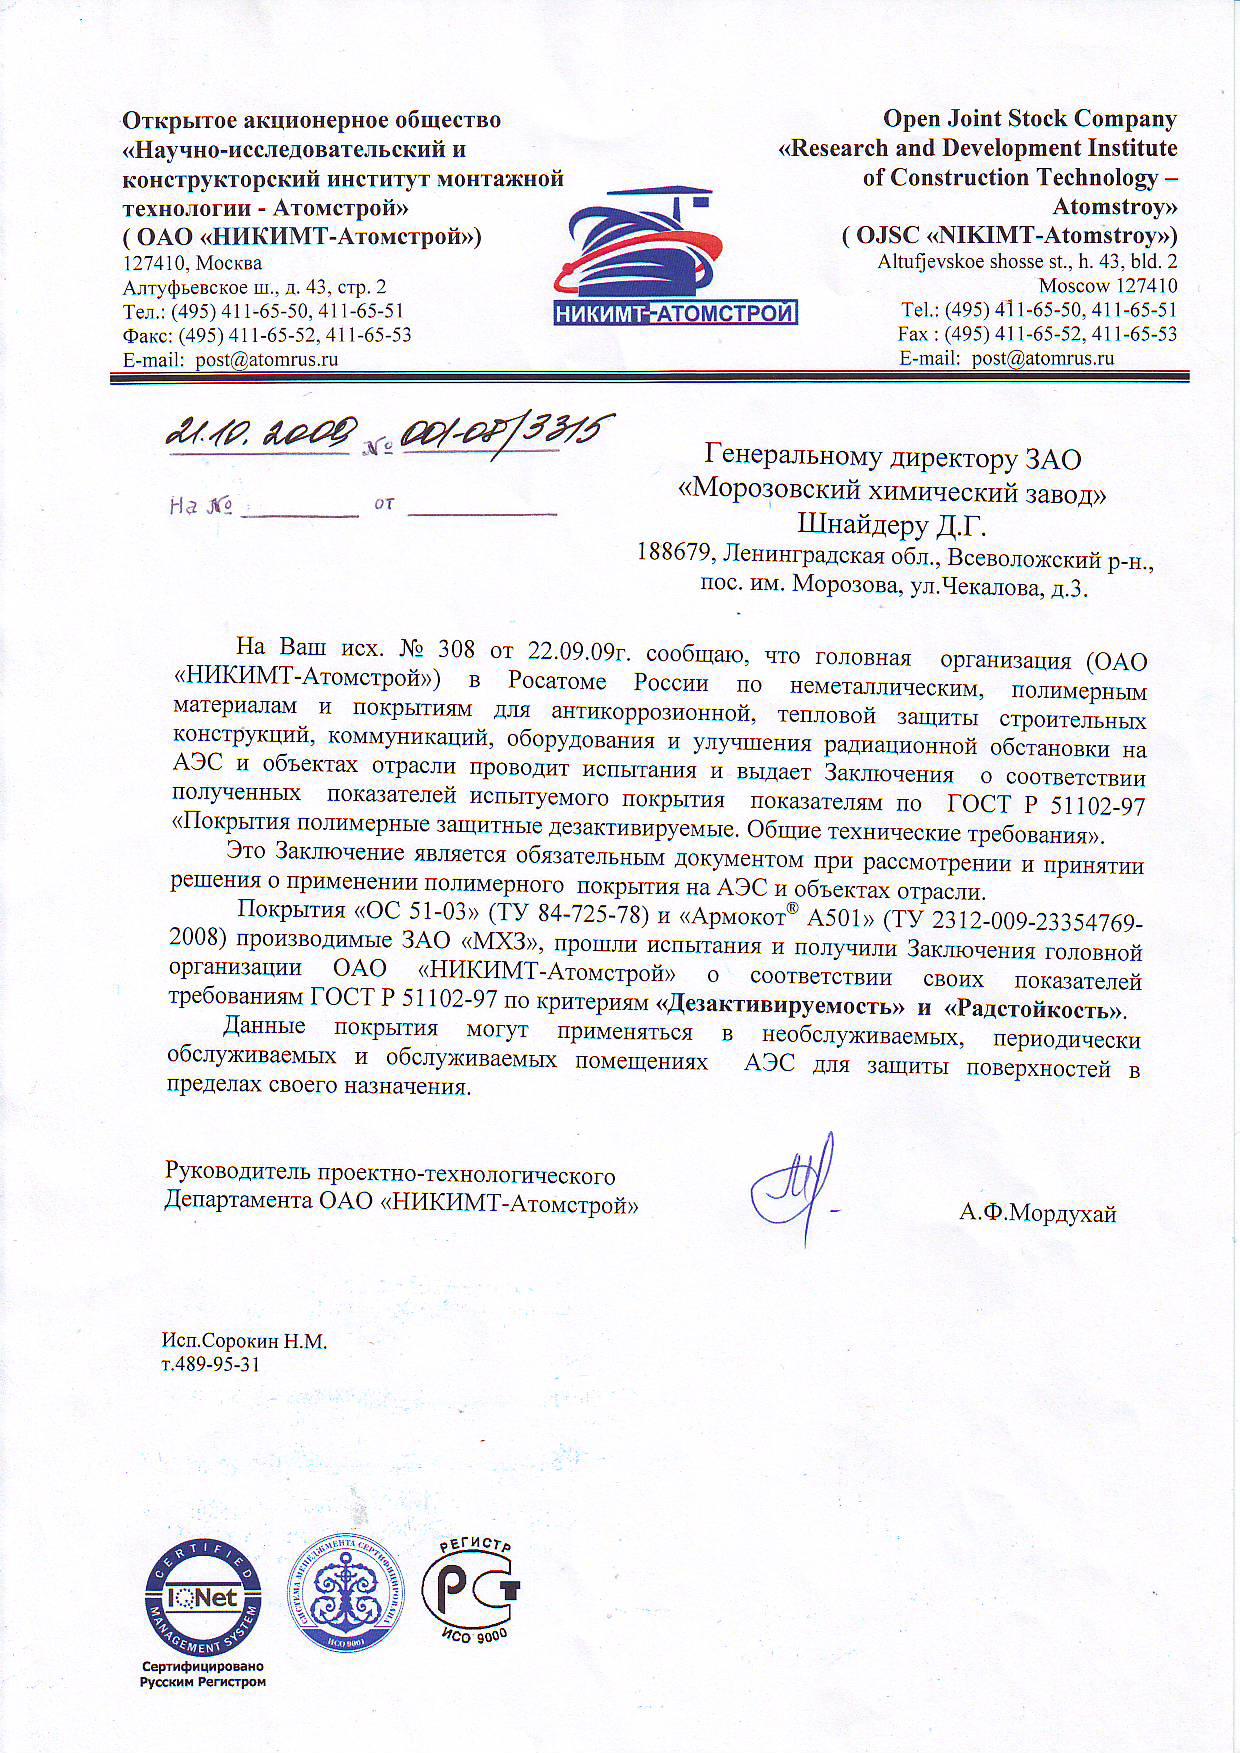 Письмо НИКИМТ Армокот А501